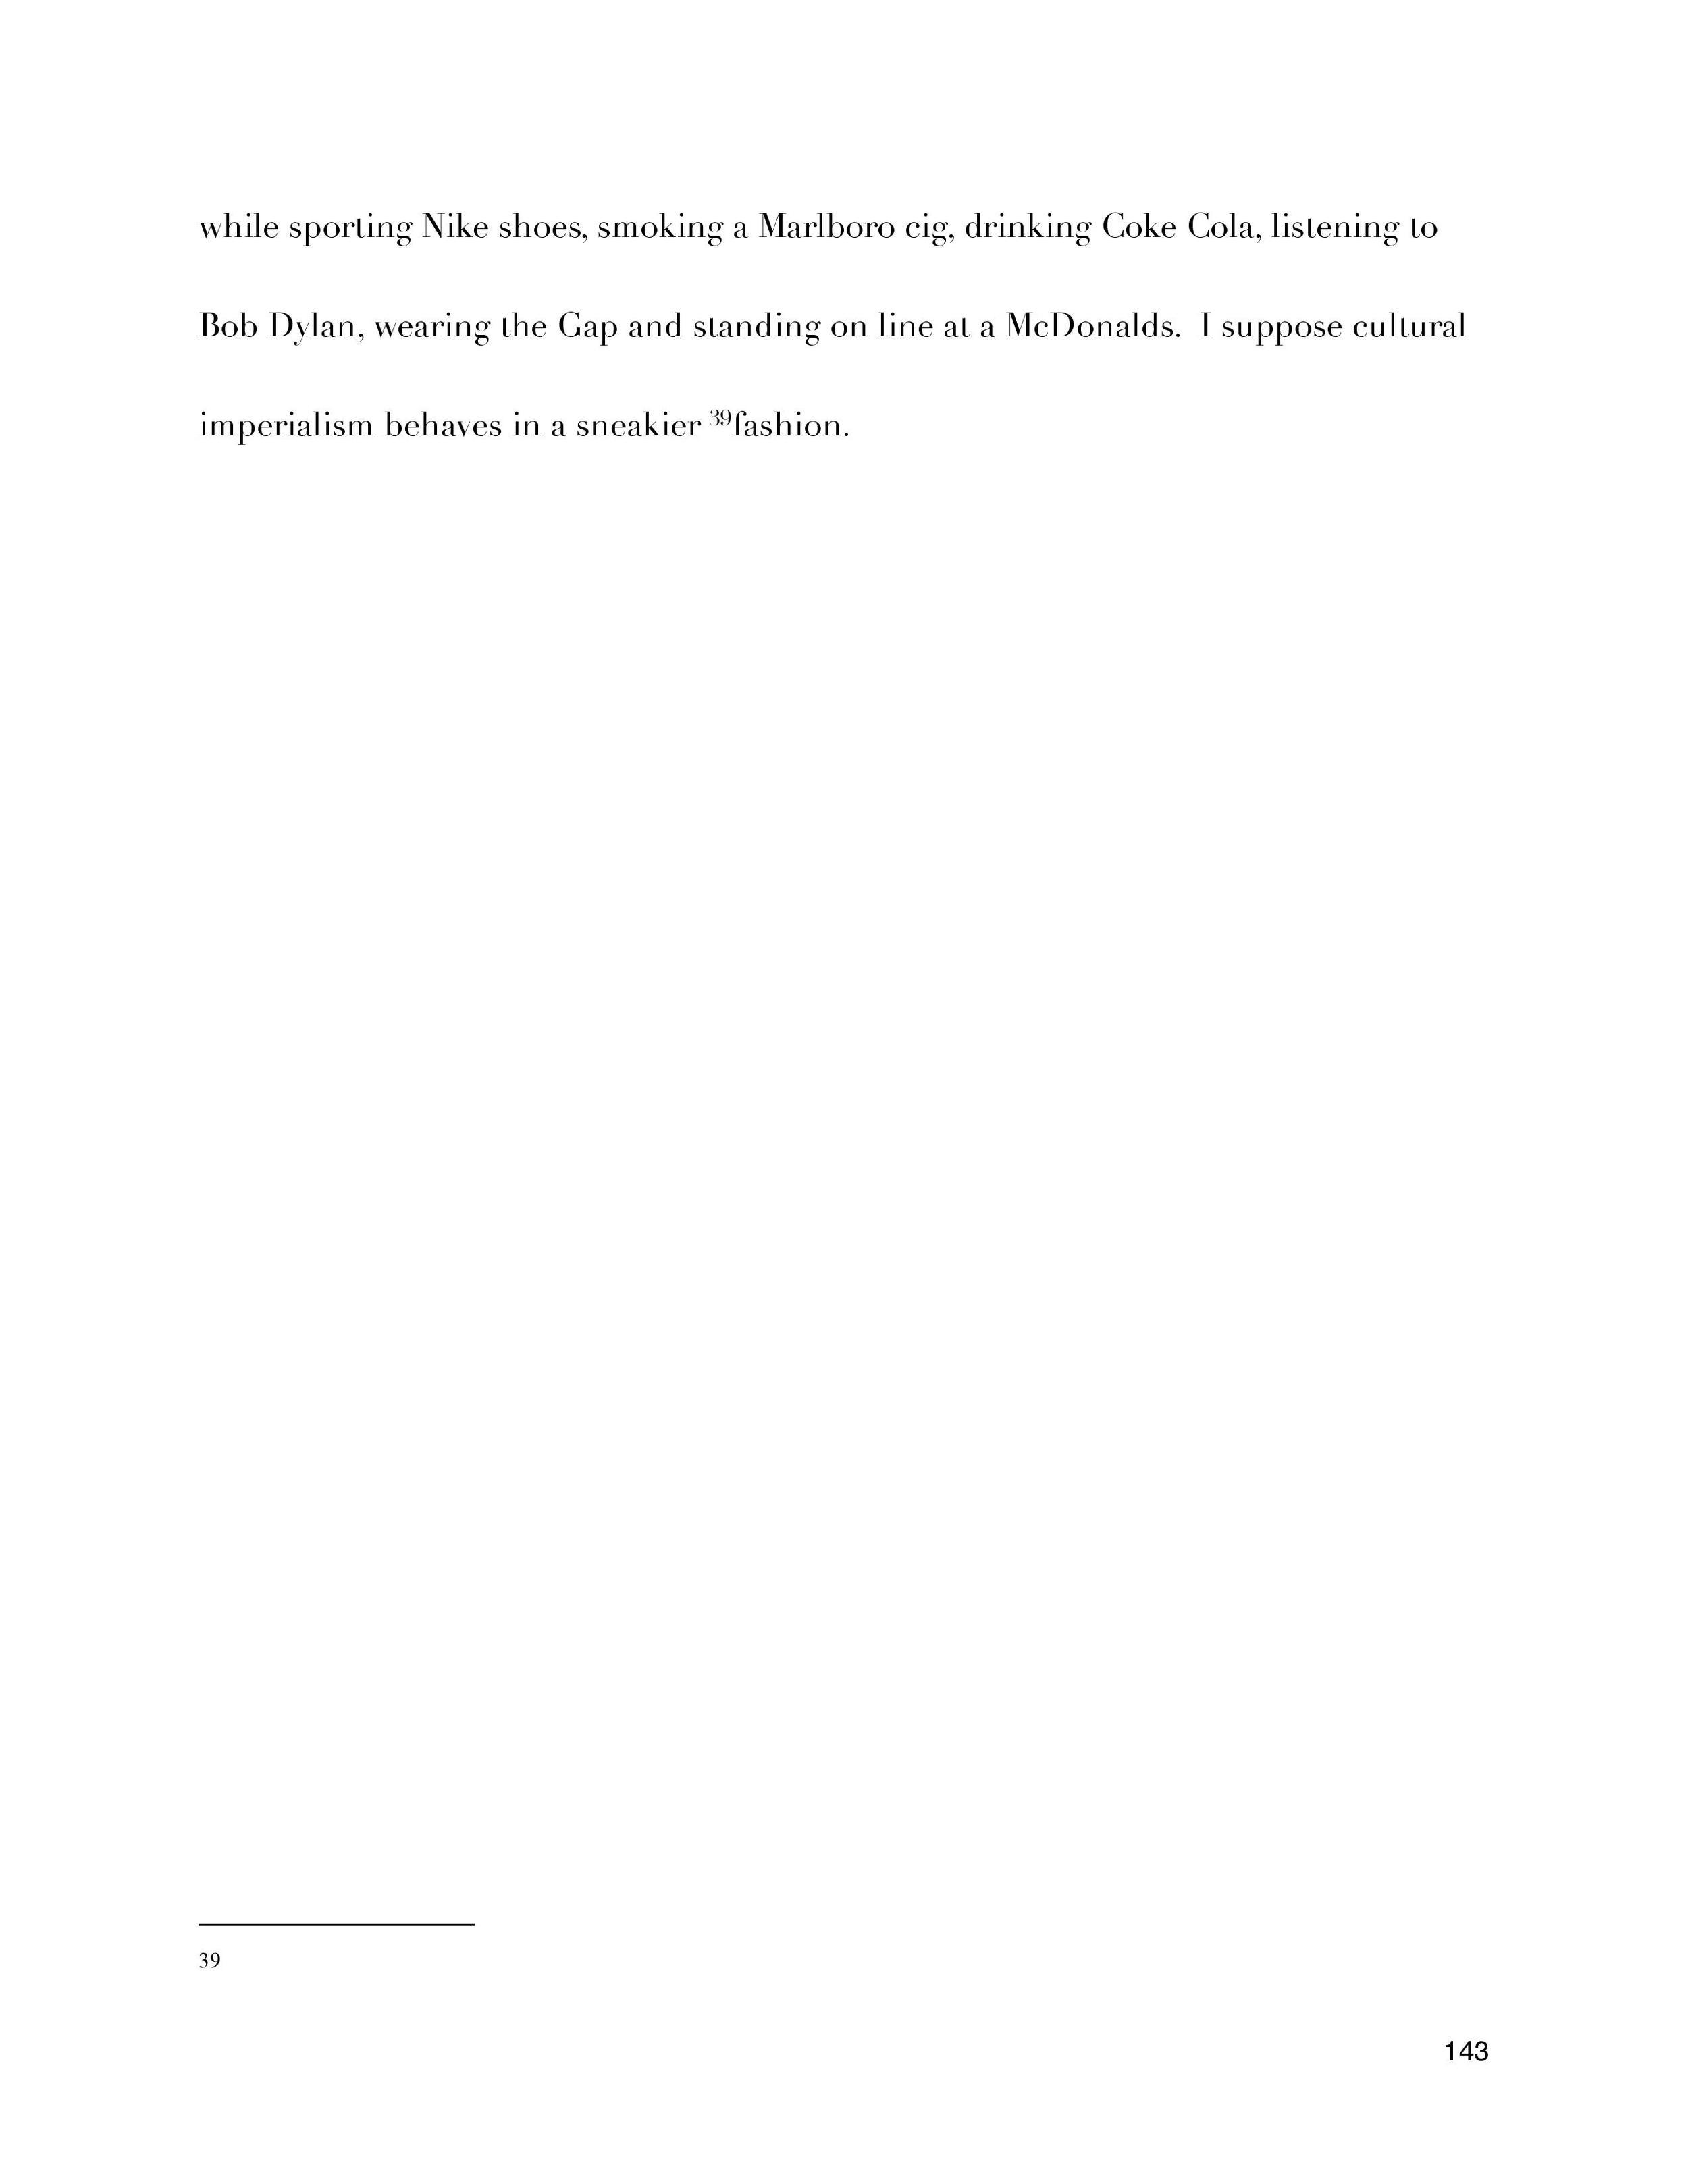 ShatteredGlass-page-144.jpg